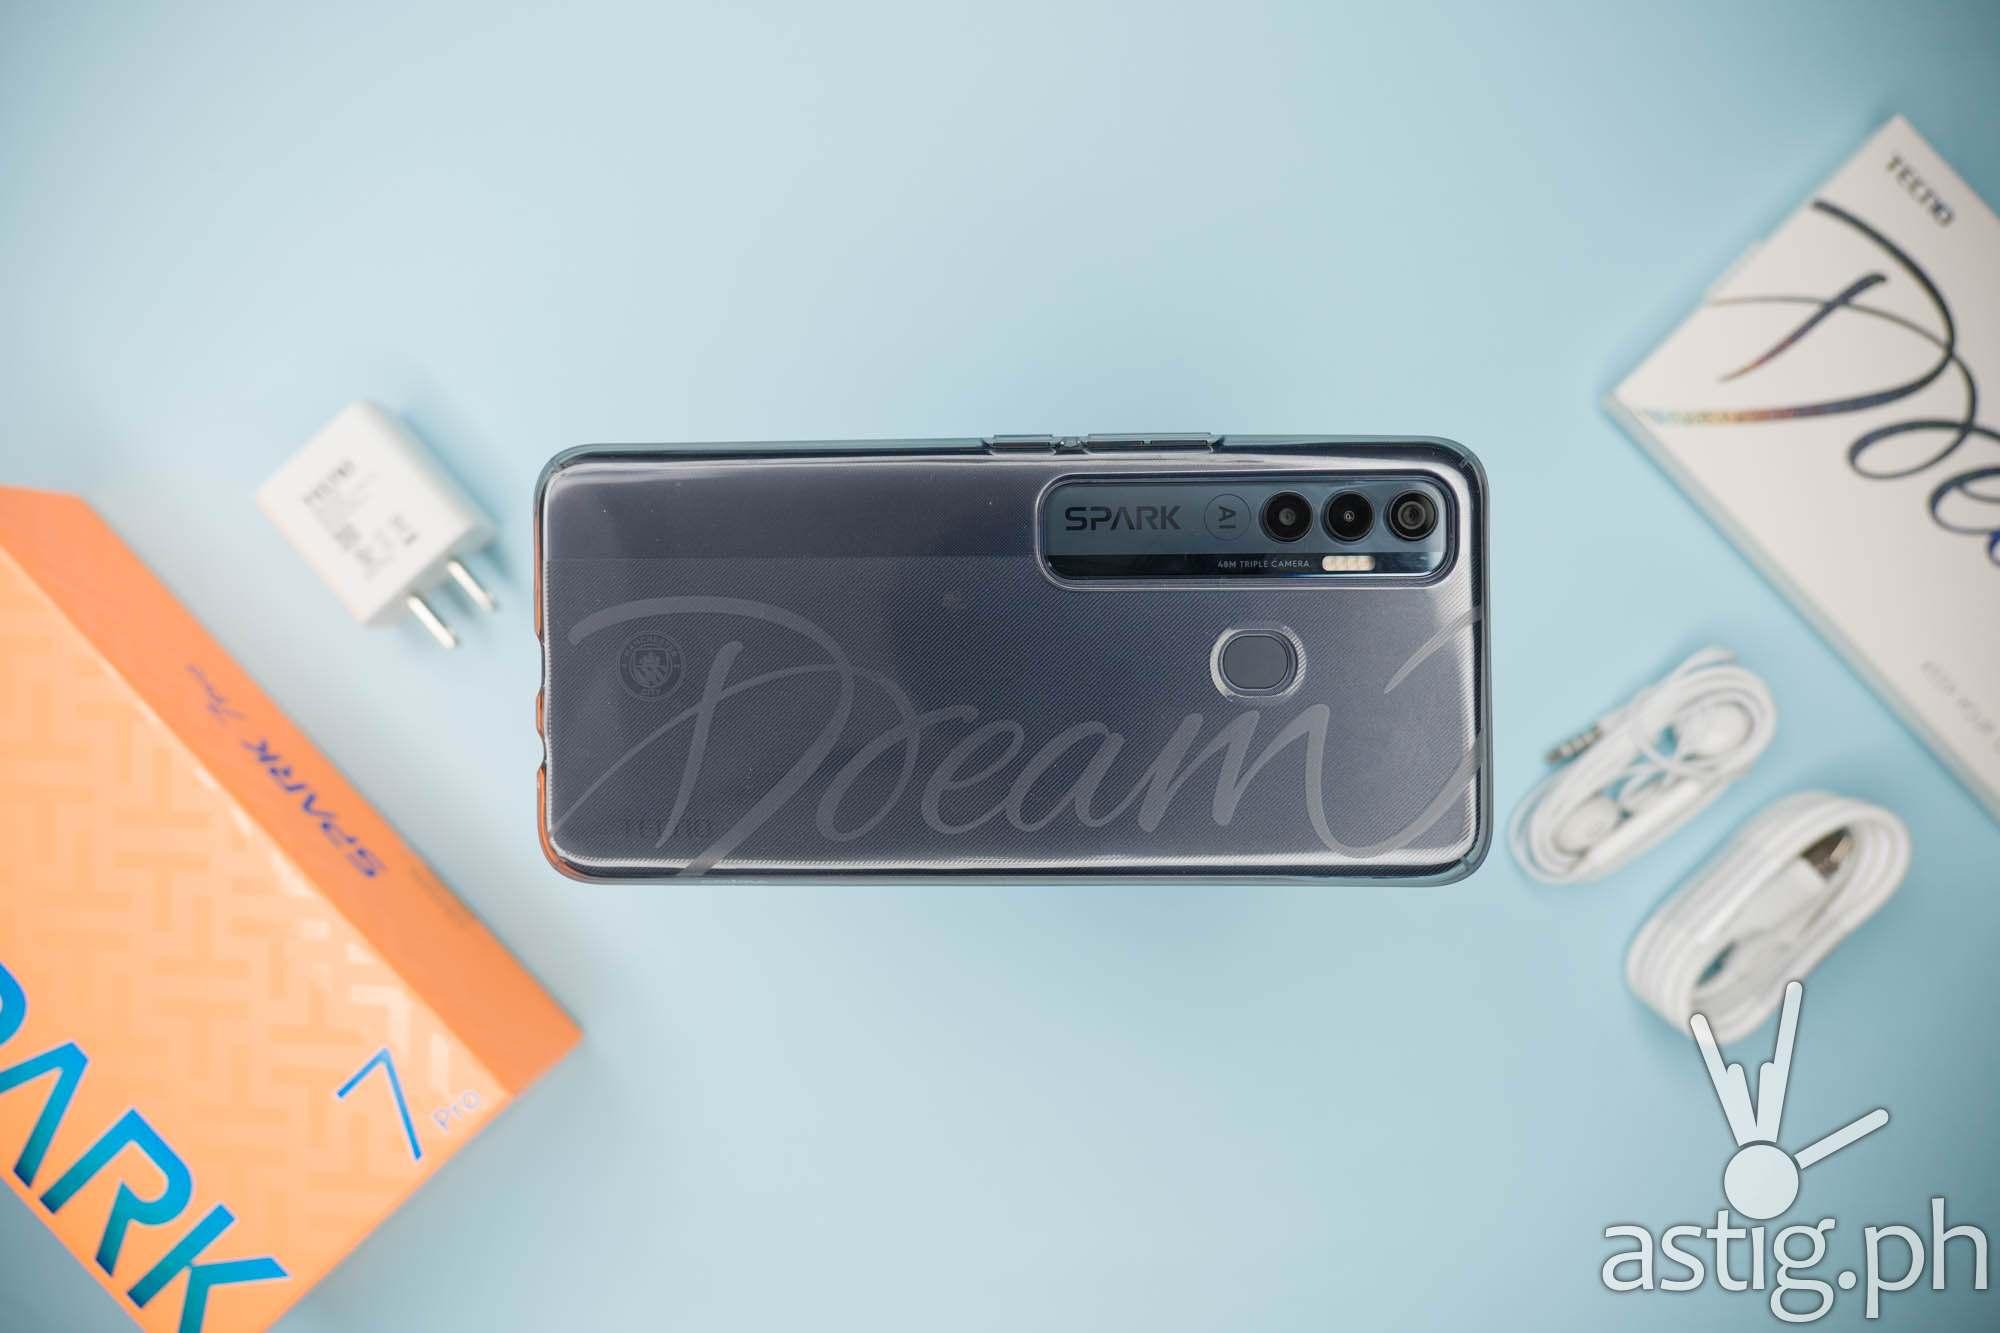 Back with Dream jelly case - TECNO Spark 7 Pro